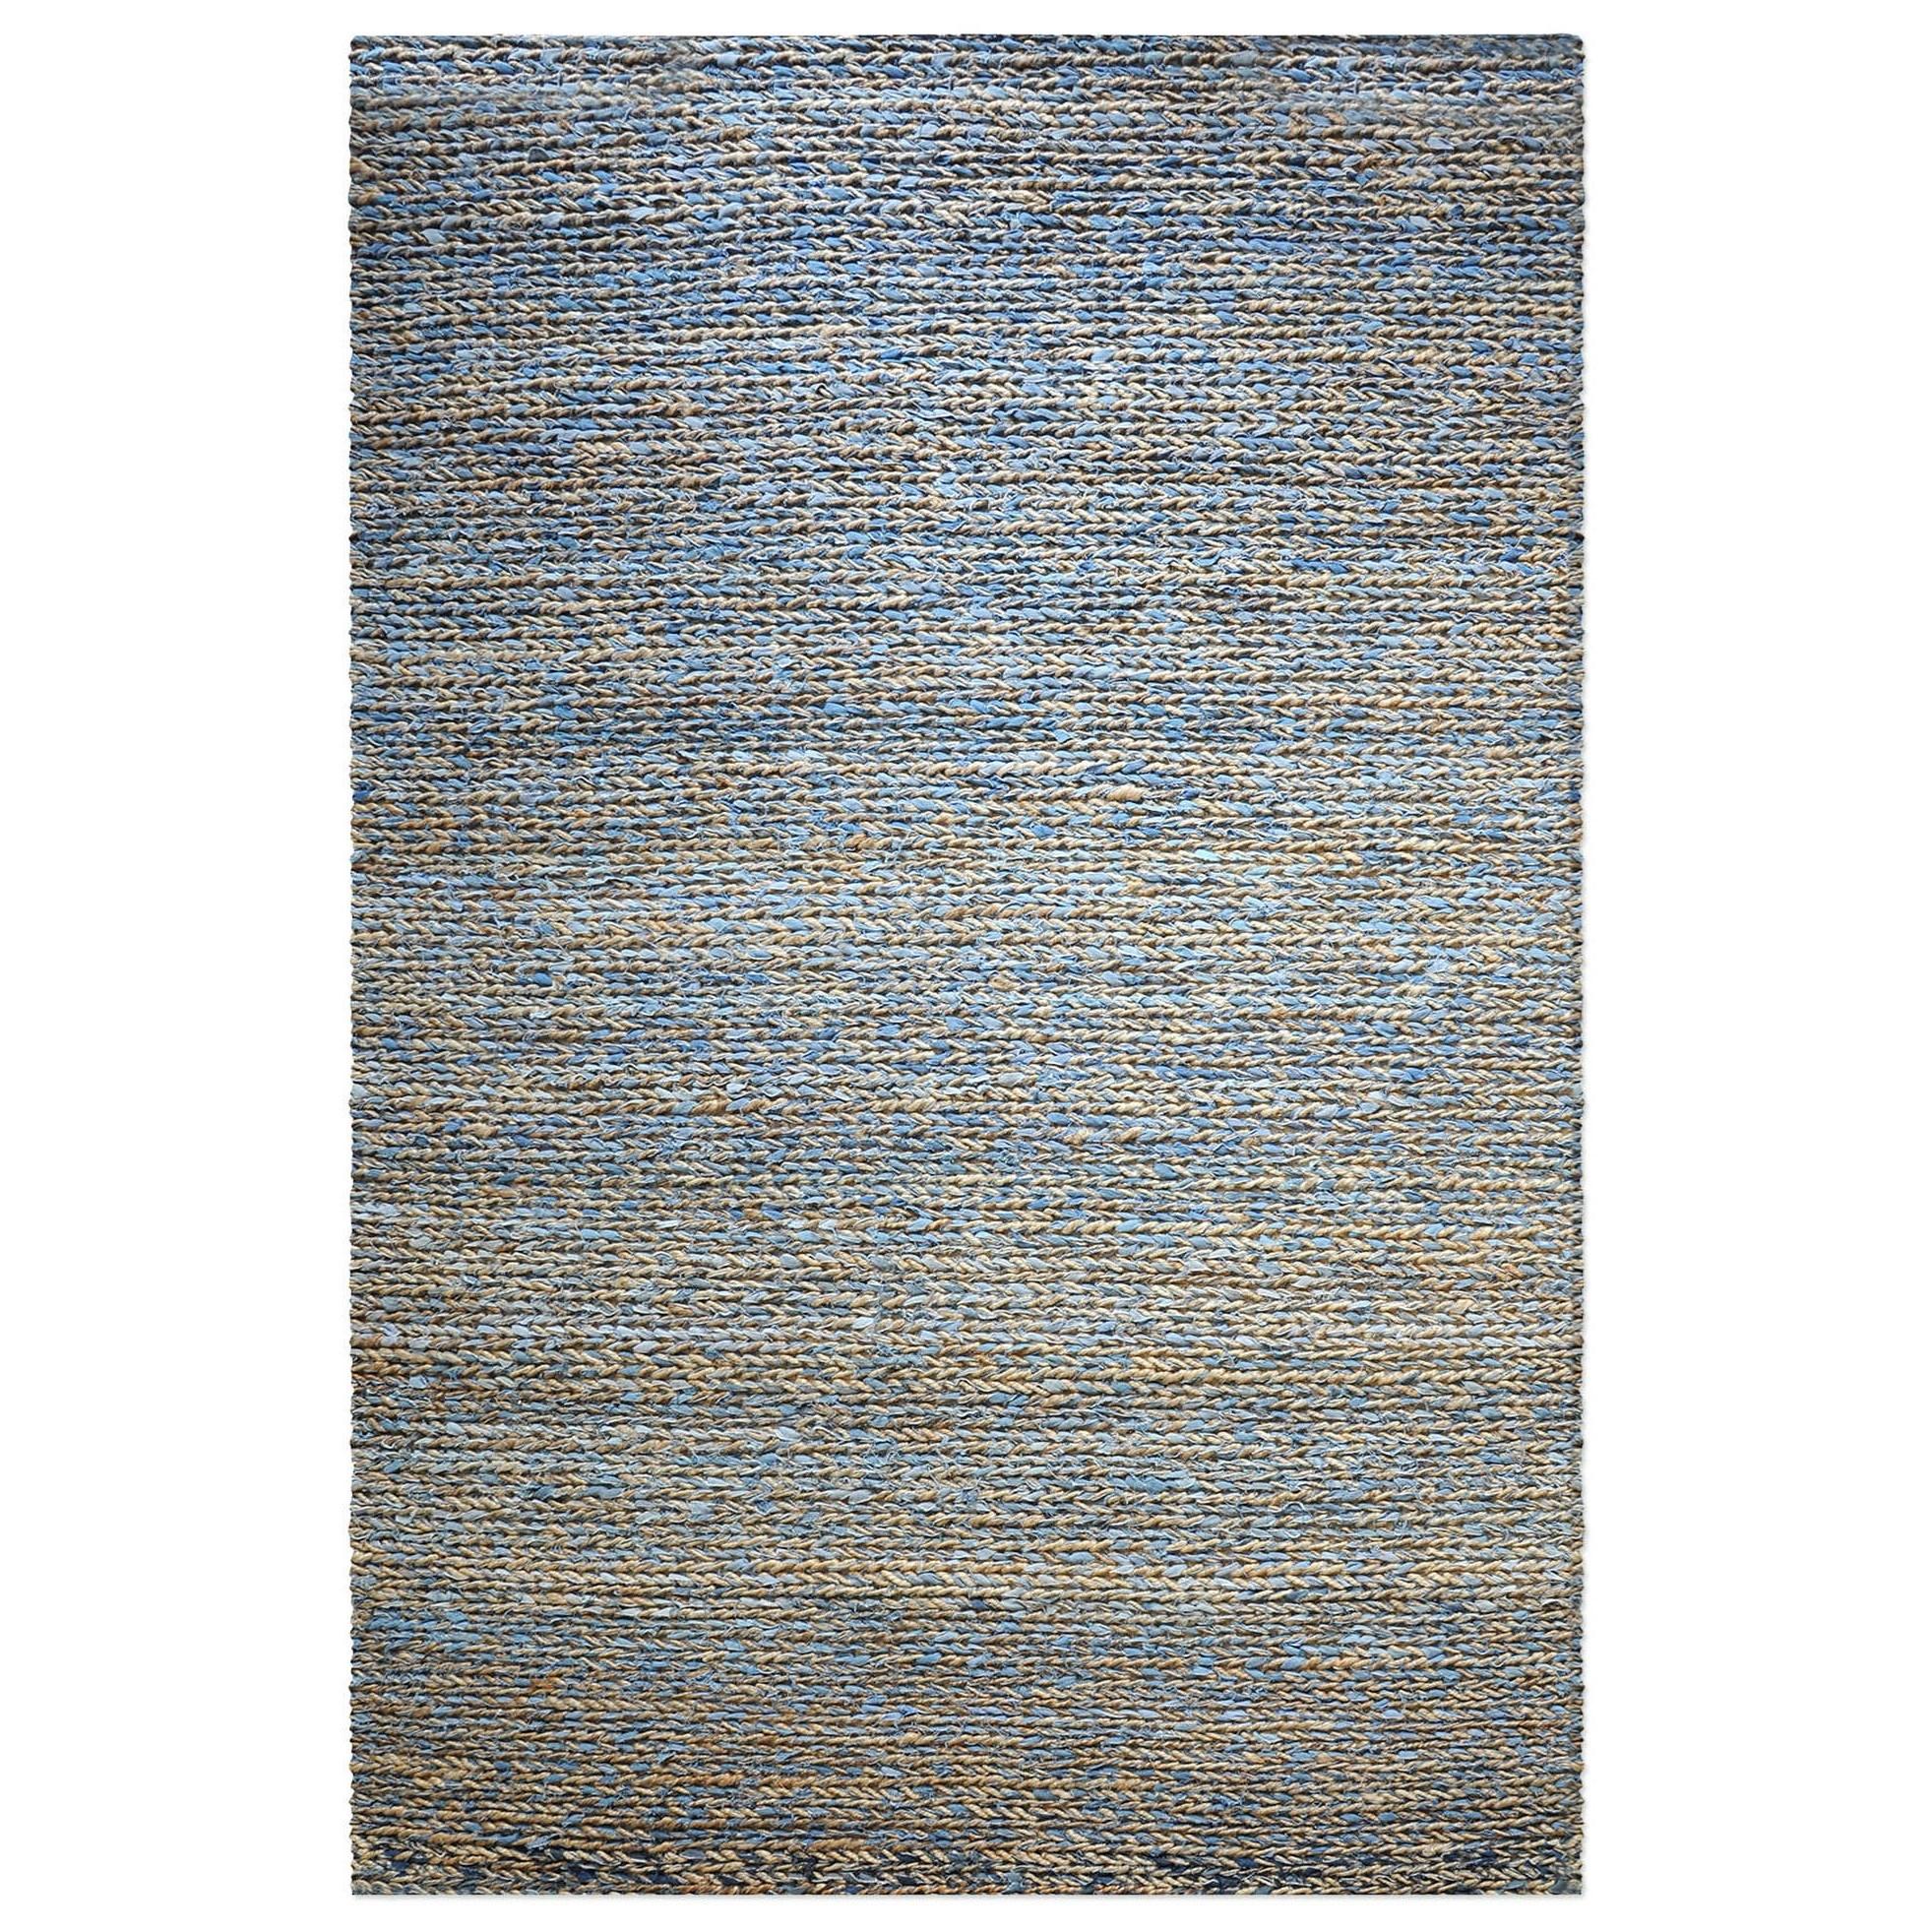 Euston Natural-Blue 9 x 12 Rug